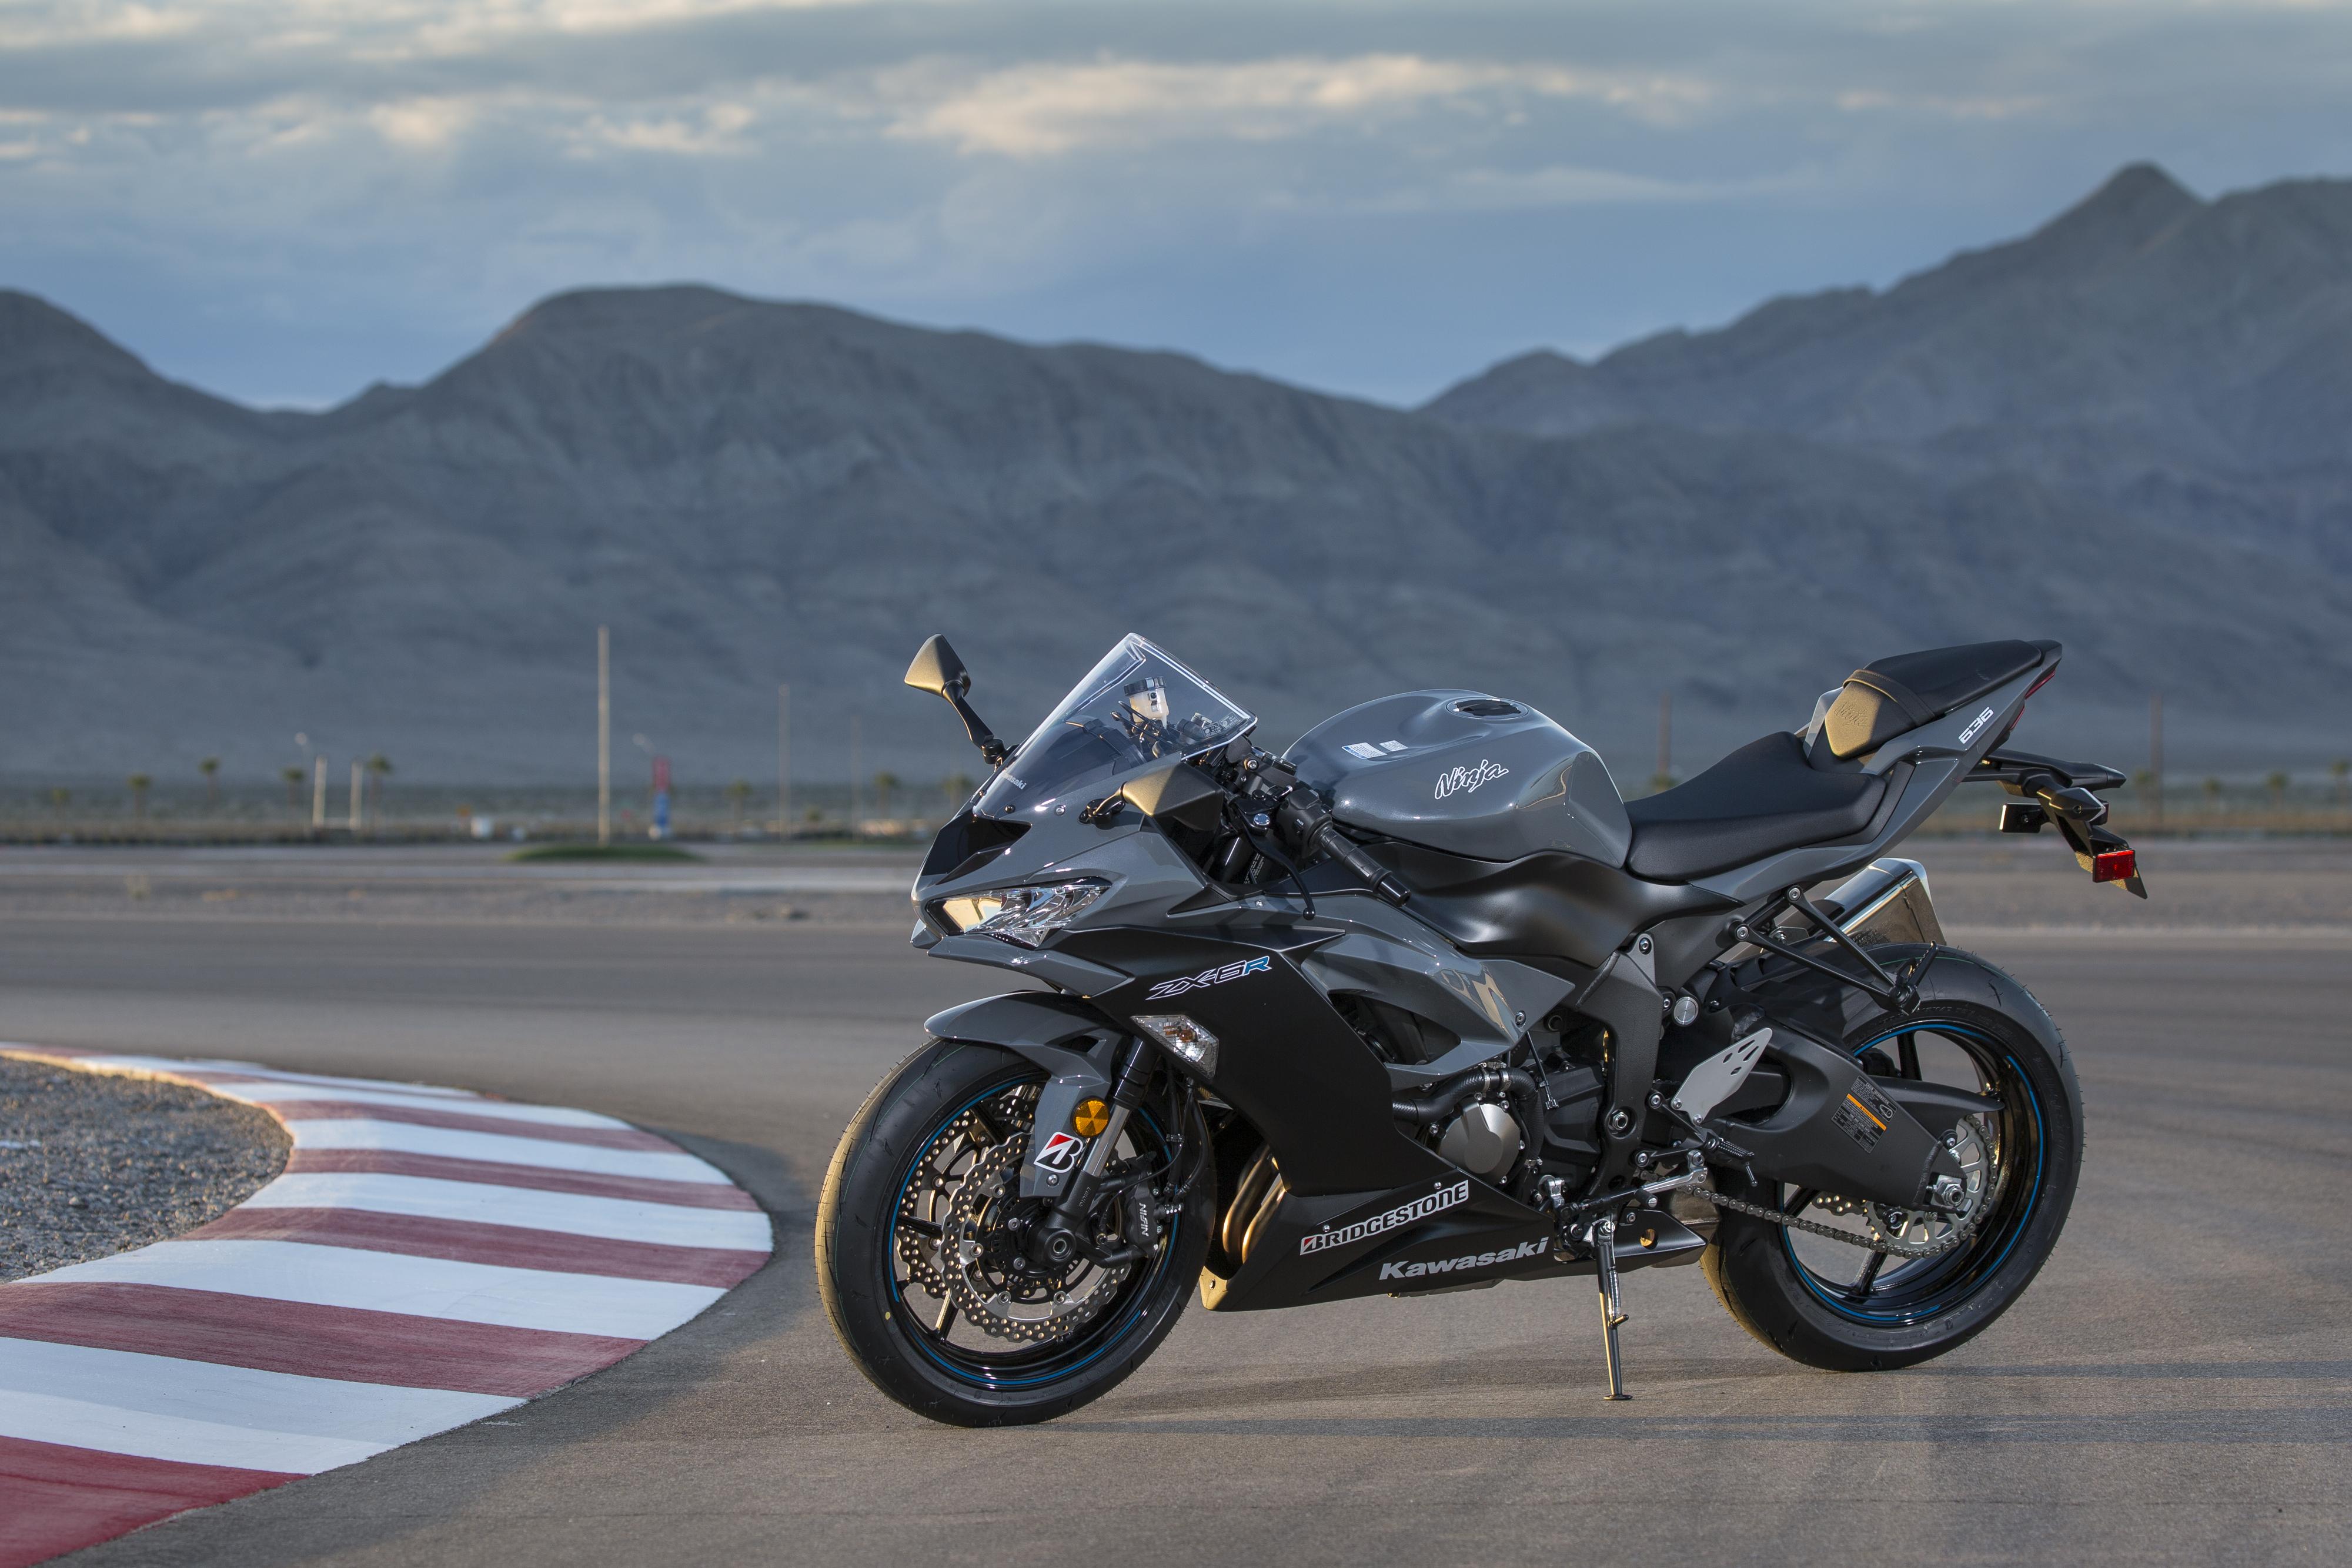 2019 Kawasaki Ninja ZX-6R first ride review - RevZilla